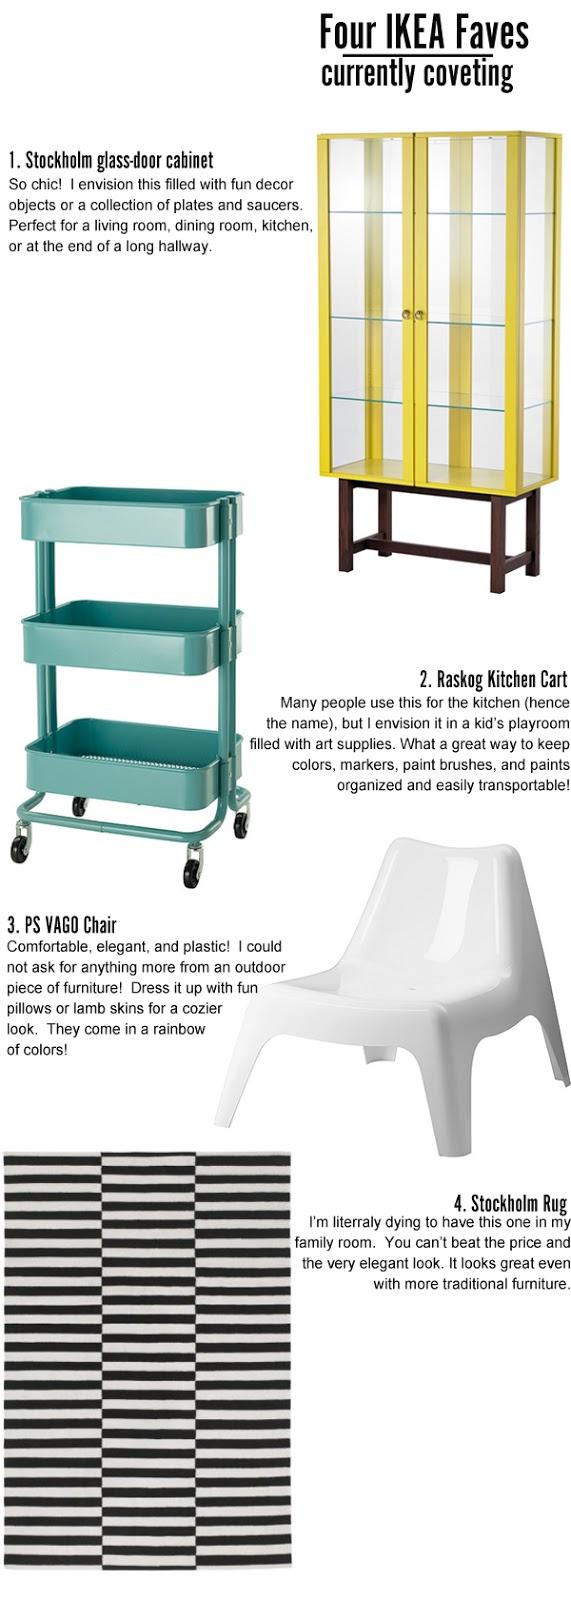 Ikea Stockholm glass door cabinet, Ikea Rascog cart, Ikea PS Vago chair, Ikea Stockholm rug